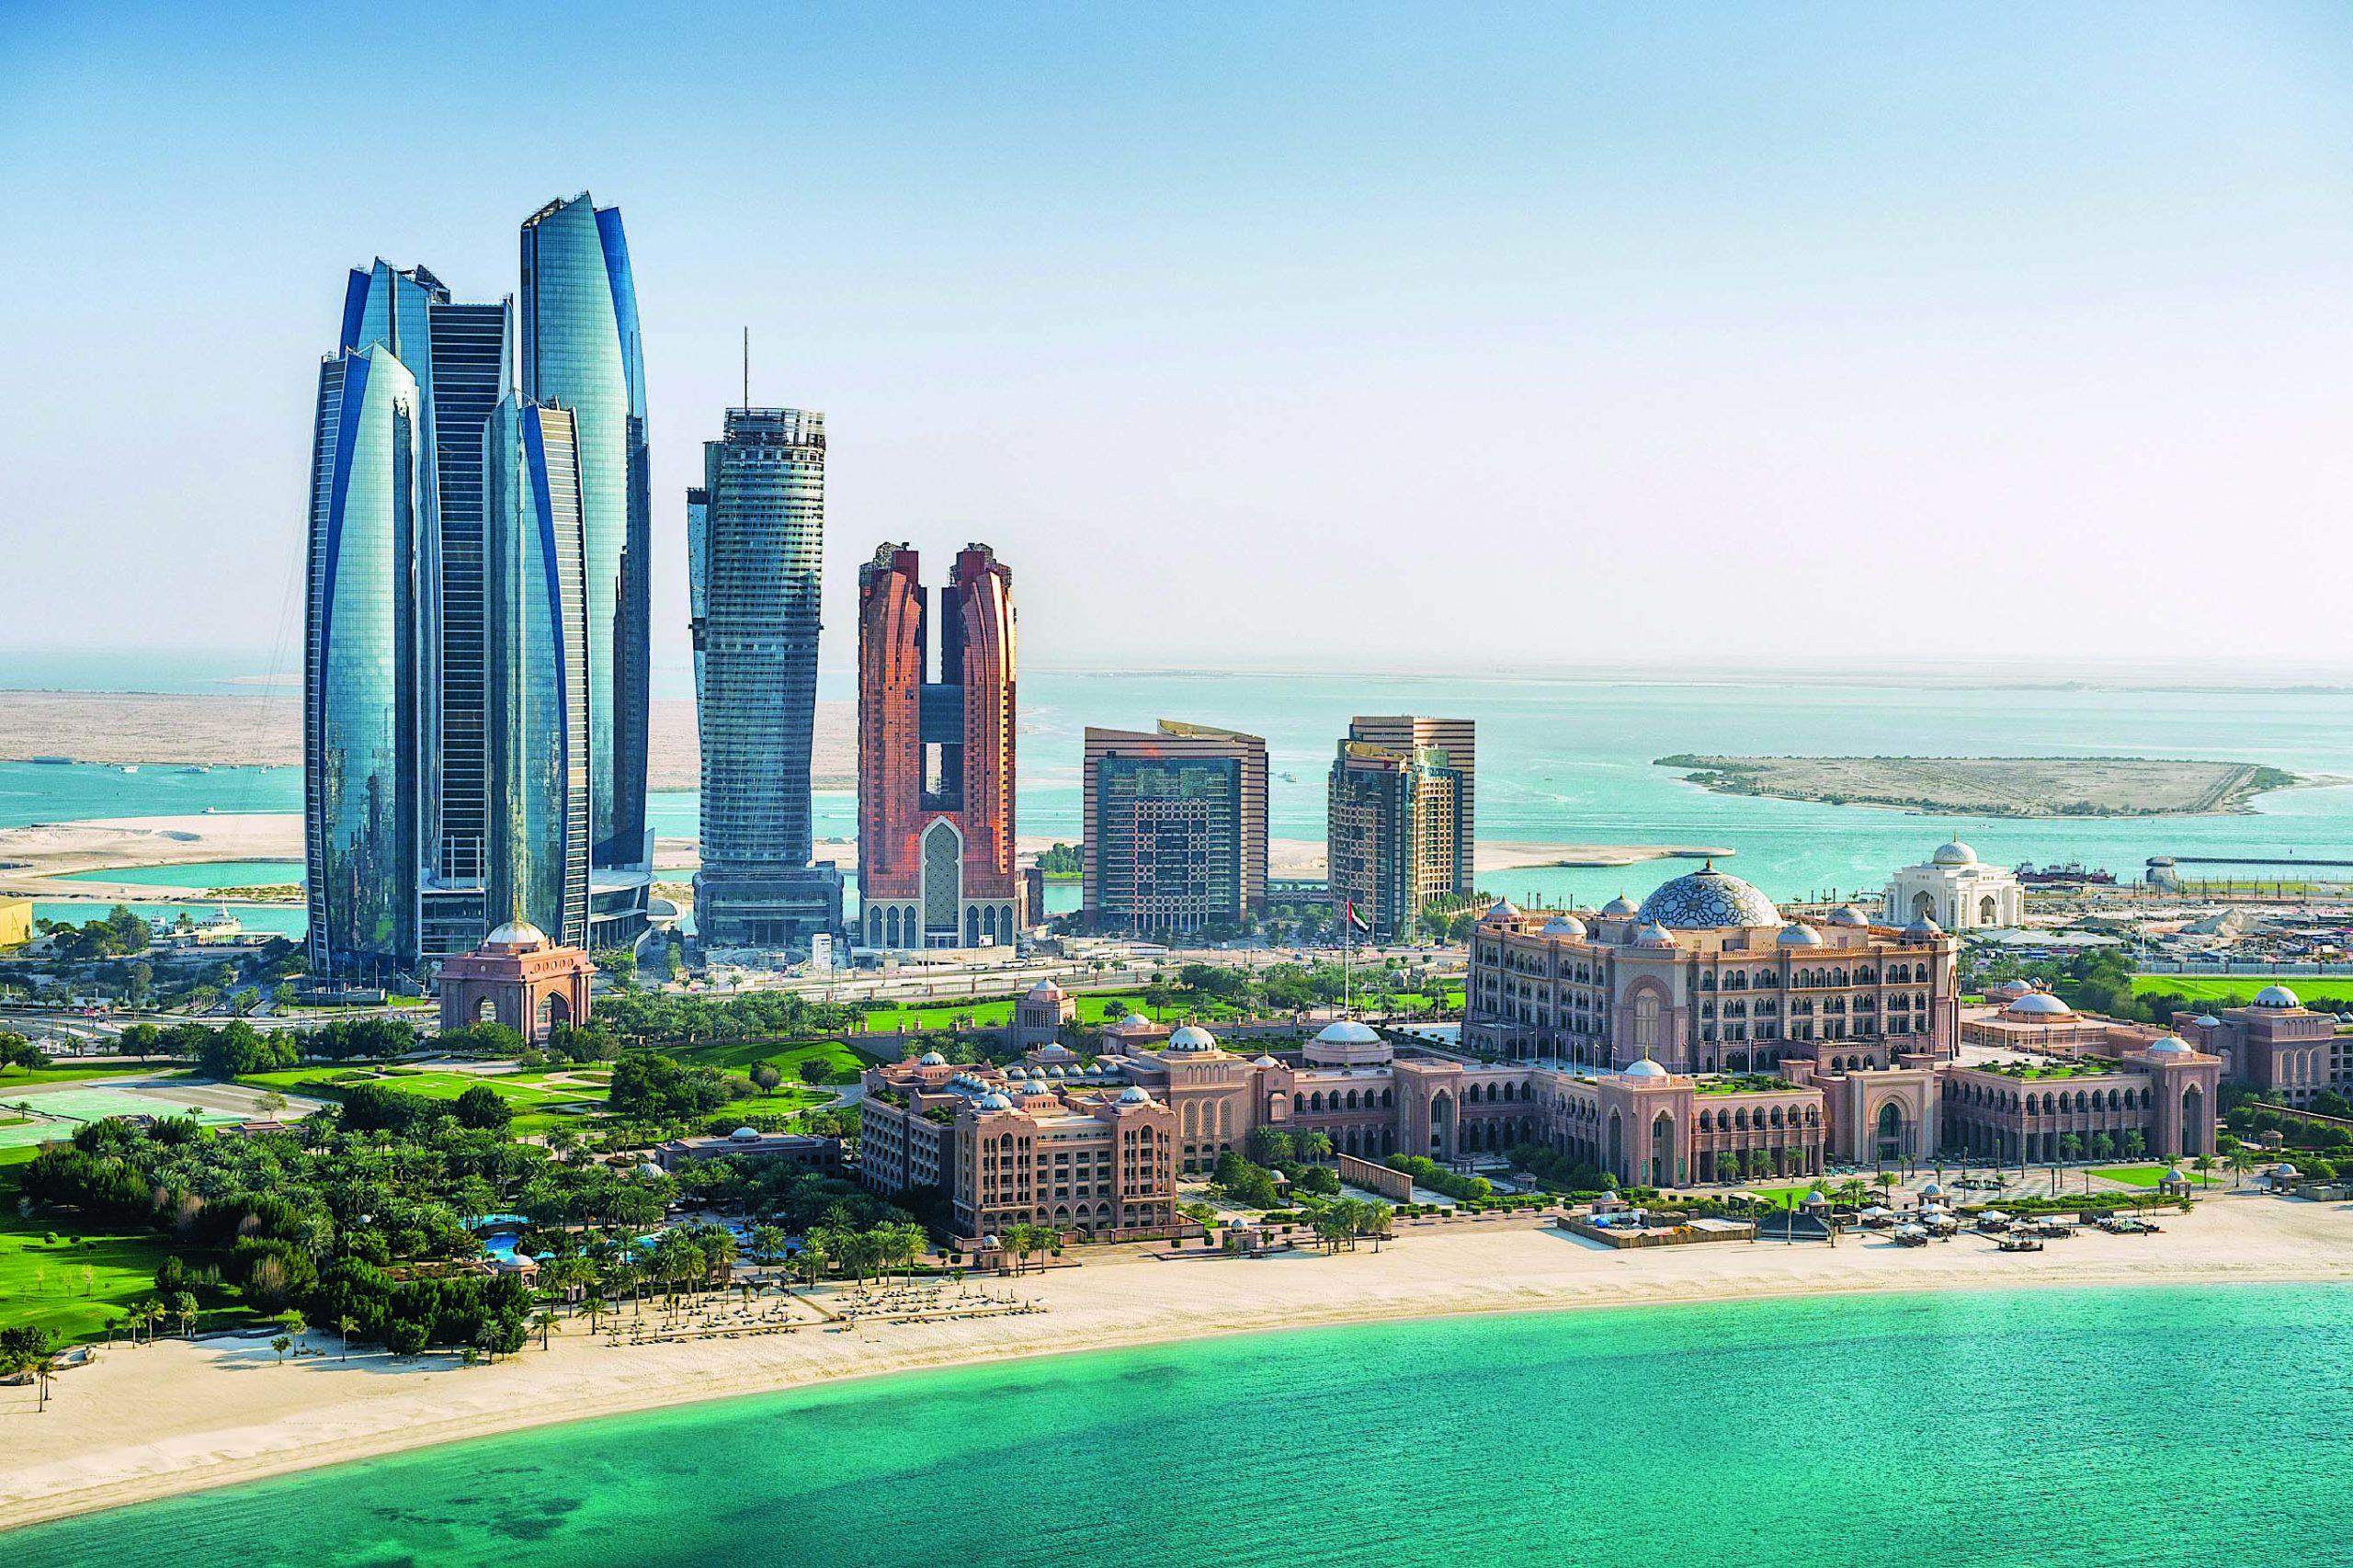 Abu Dhabi: quatro sonhos no deserto - Golfe & Turismo